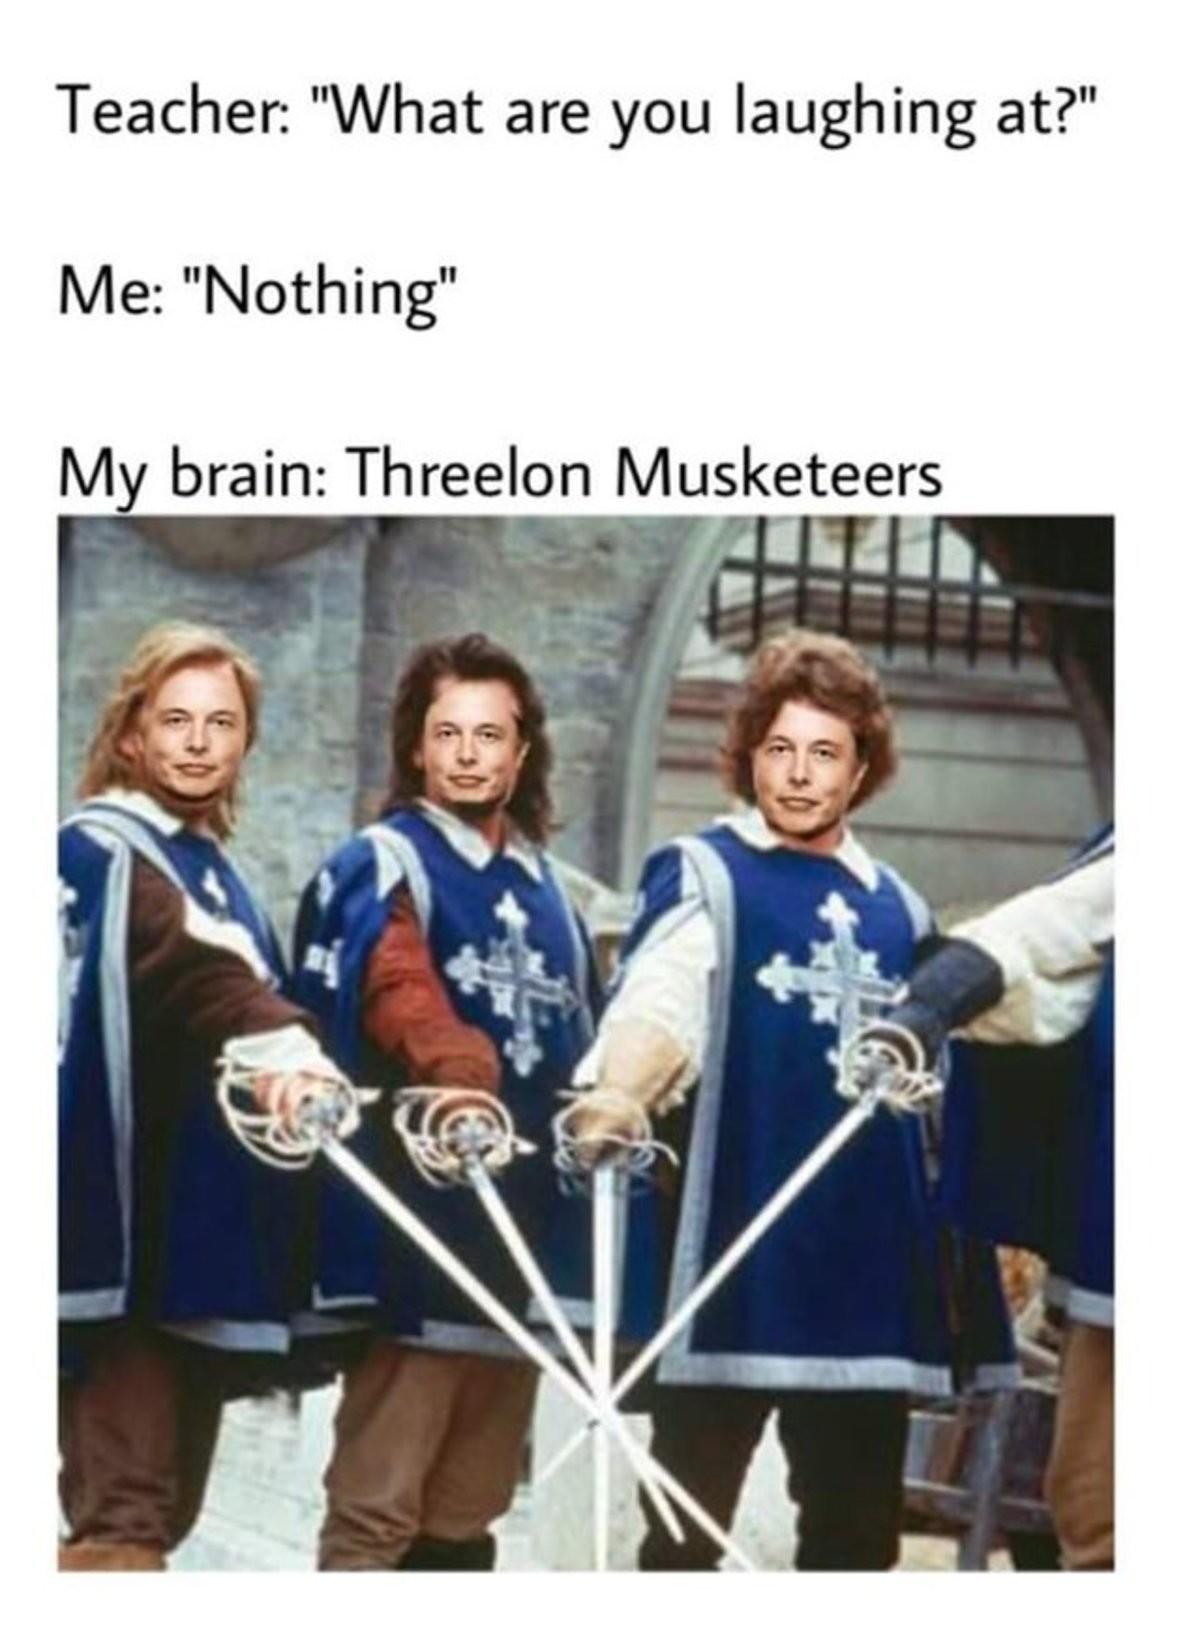 Threelon. .. Who's d'artagnan?